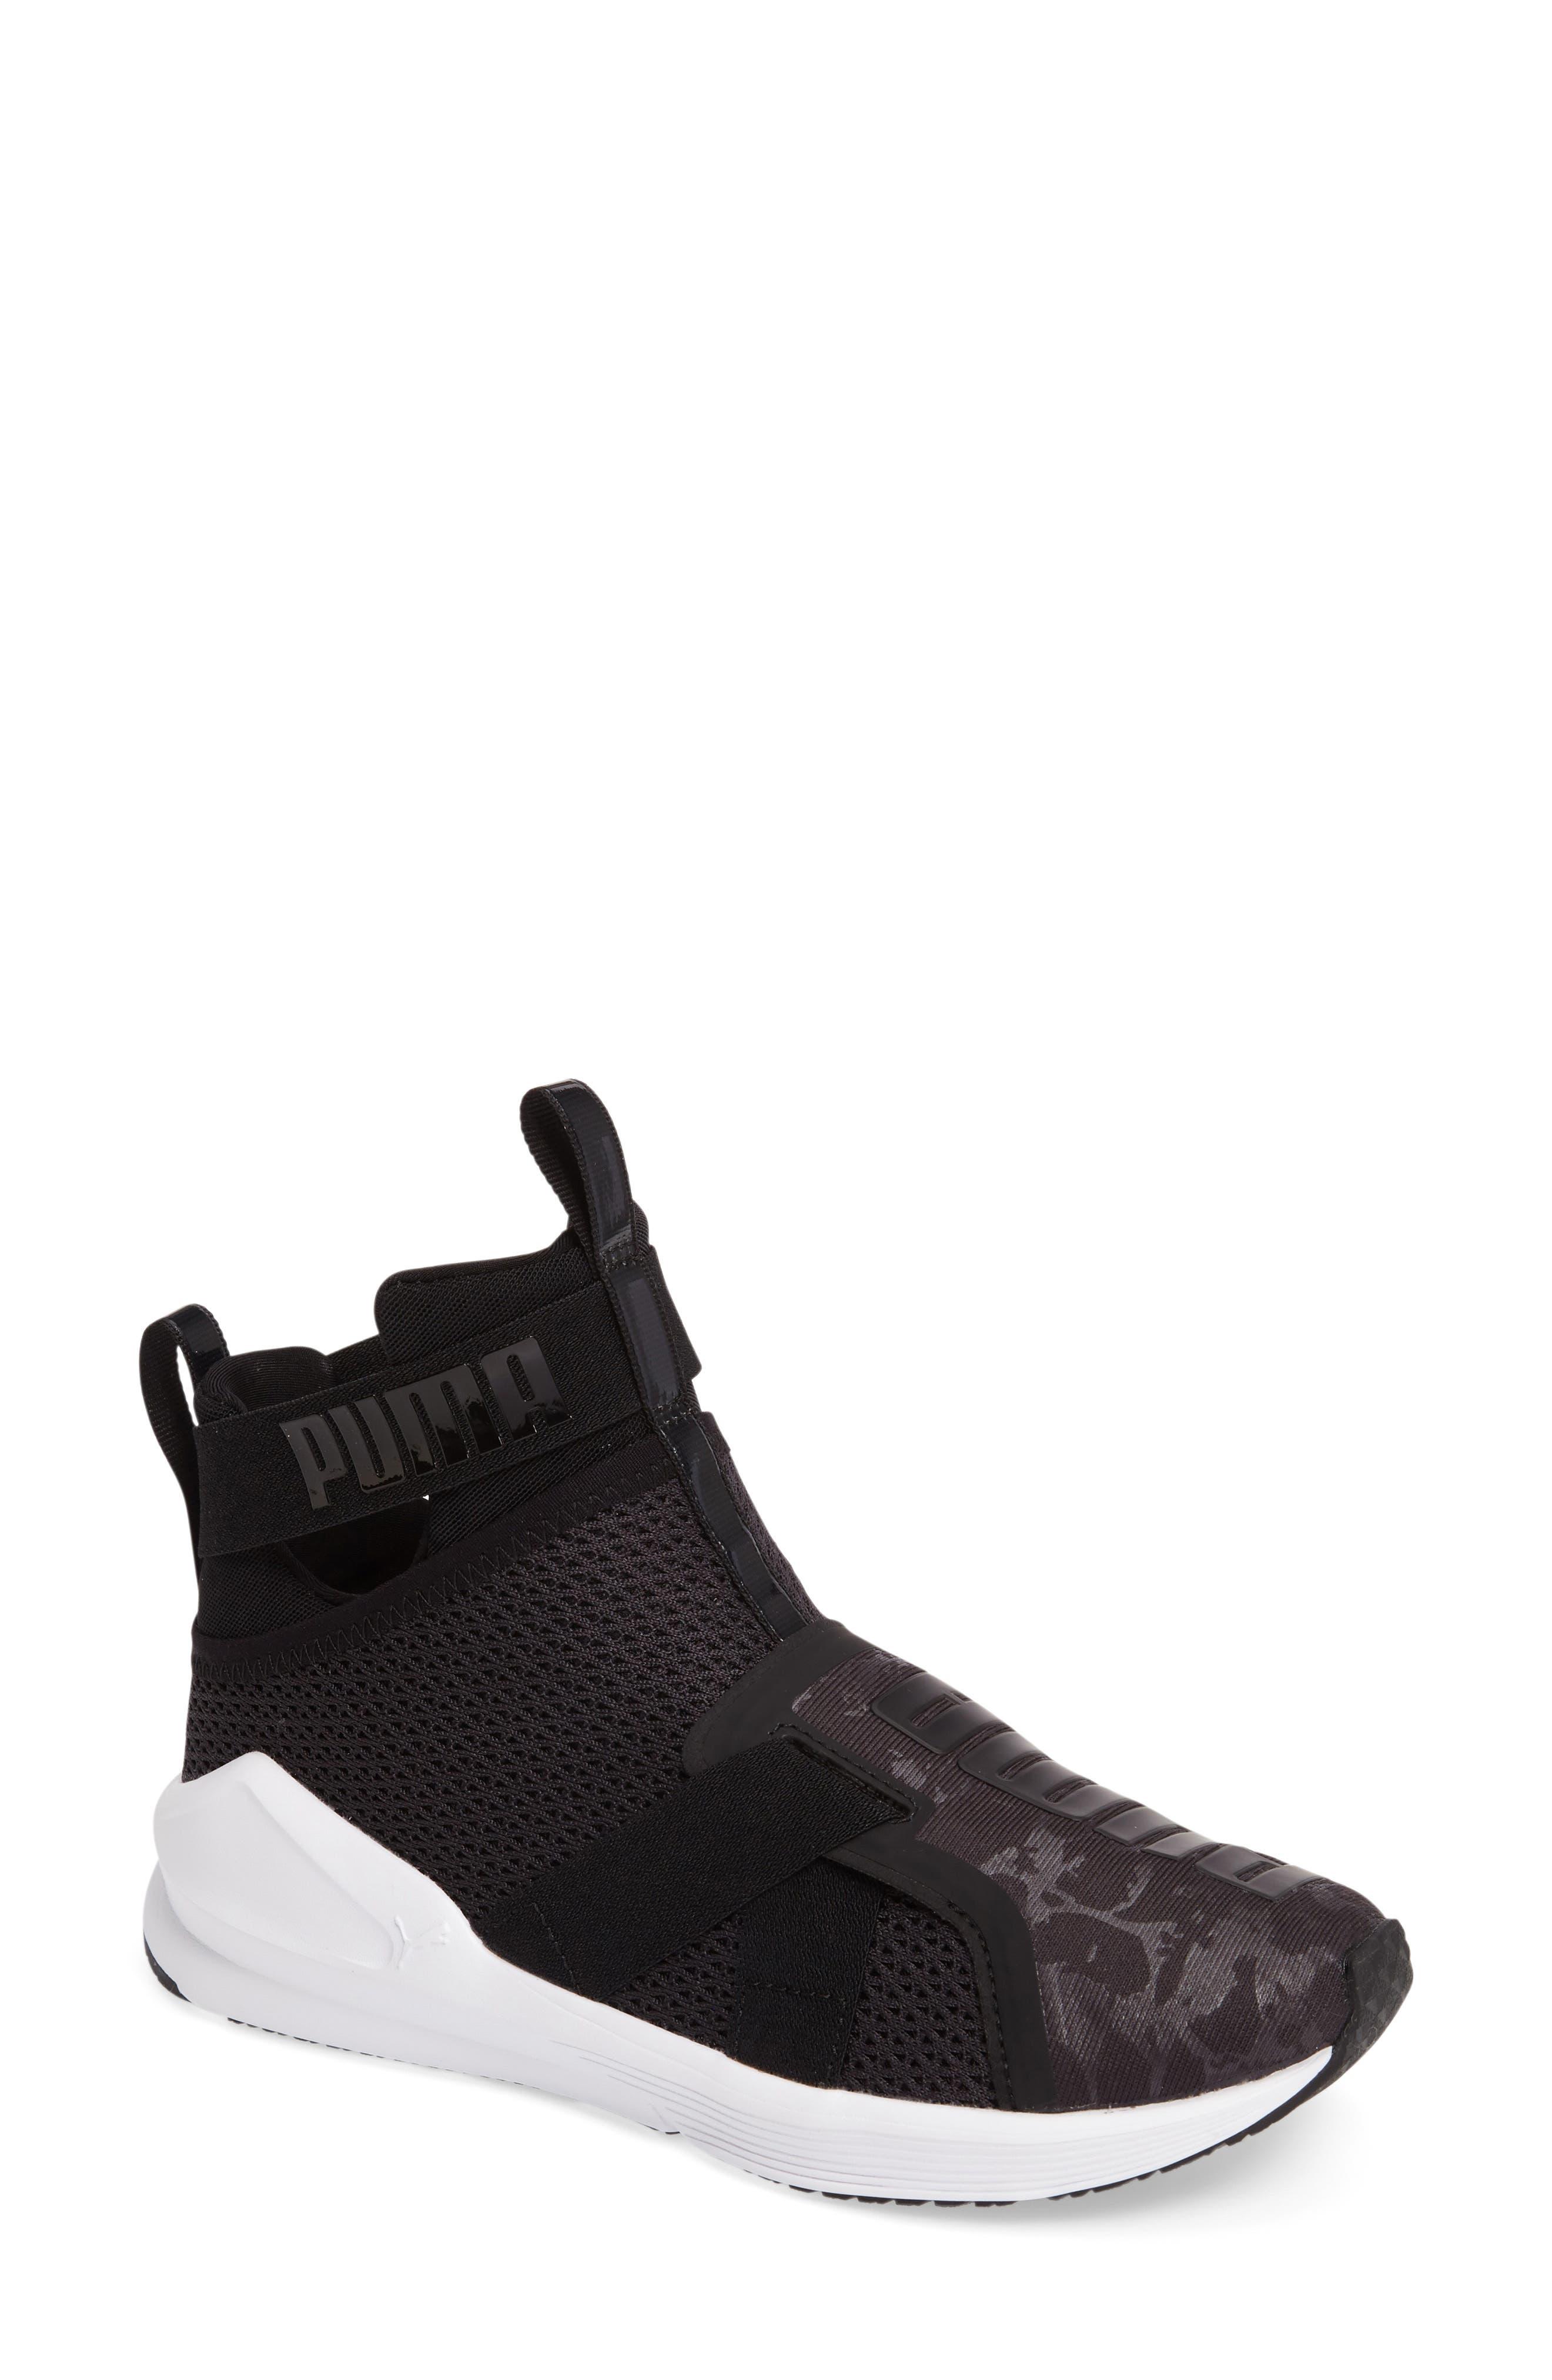 Fierce Strap Training Sneaker,                         Main,                         color, Black/ White